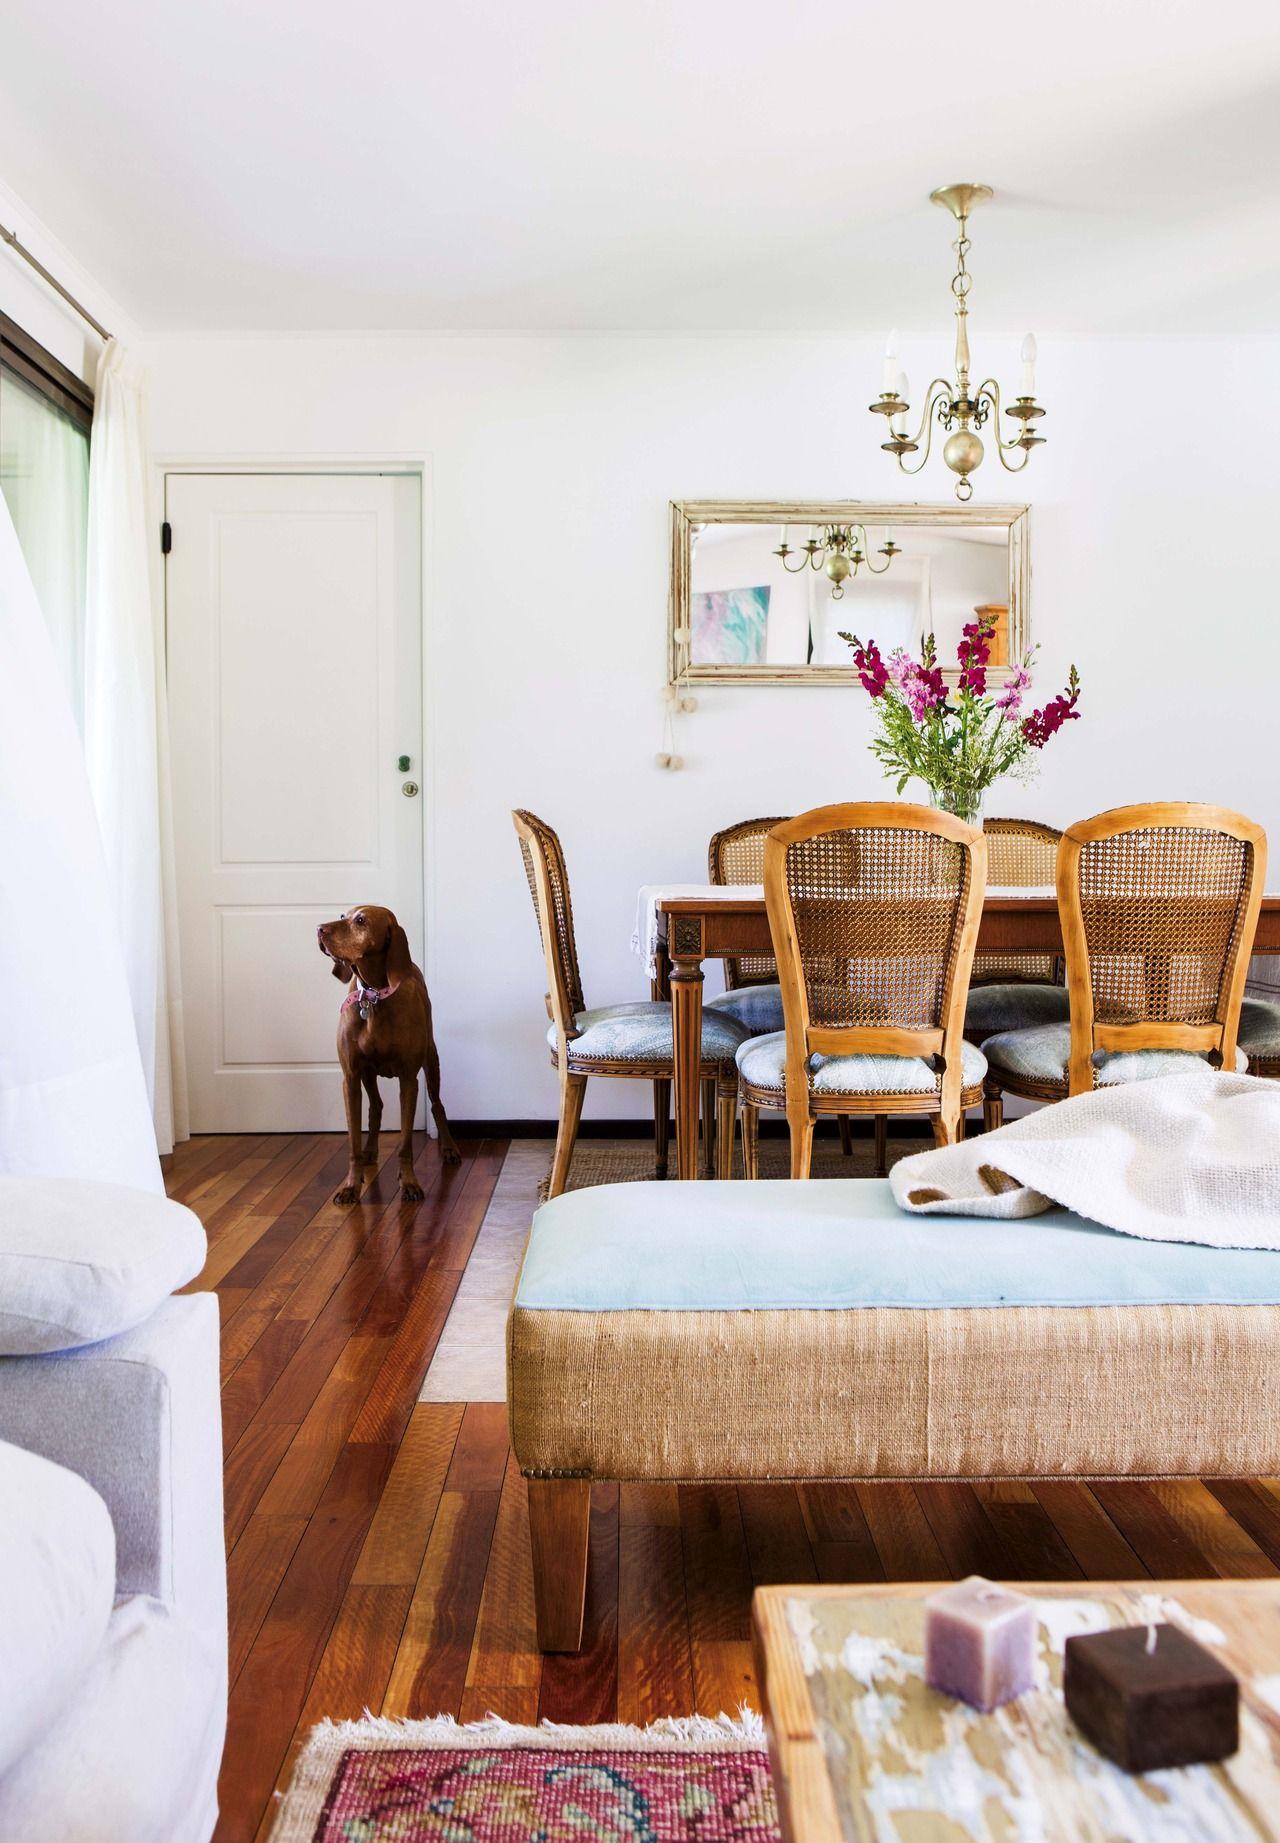 Amorosa suma de detalles en una casa fresca y artesanal | Pinterest ...